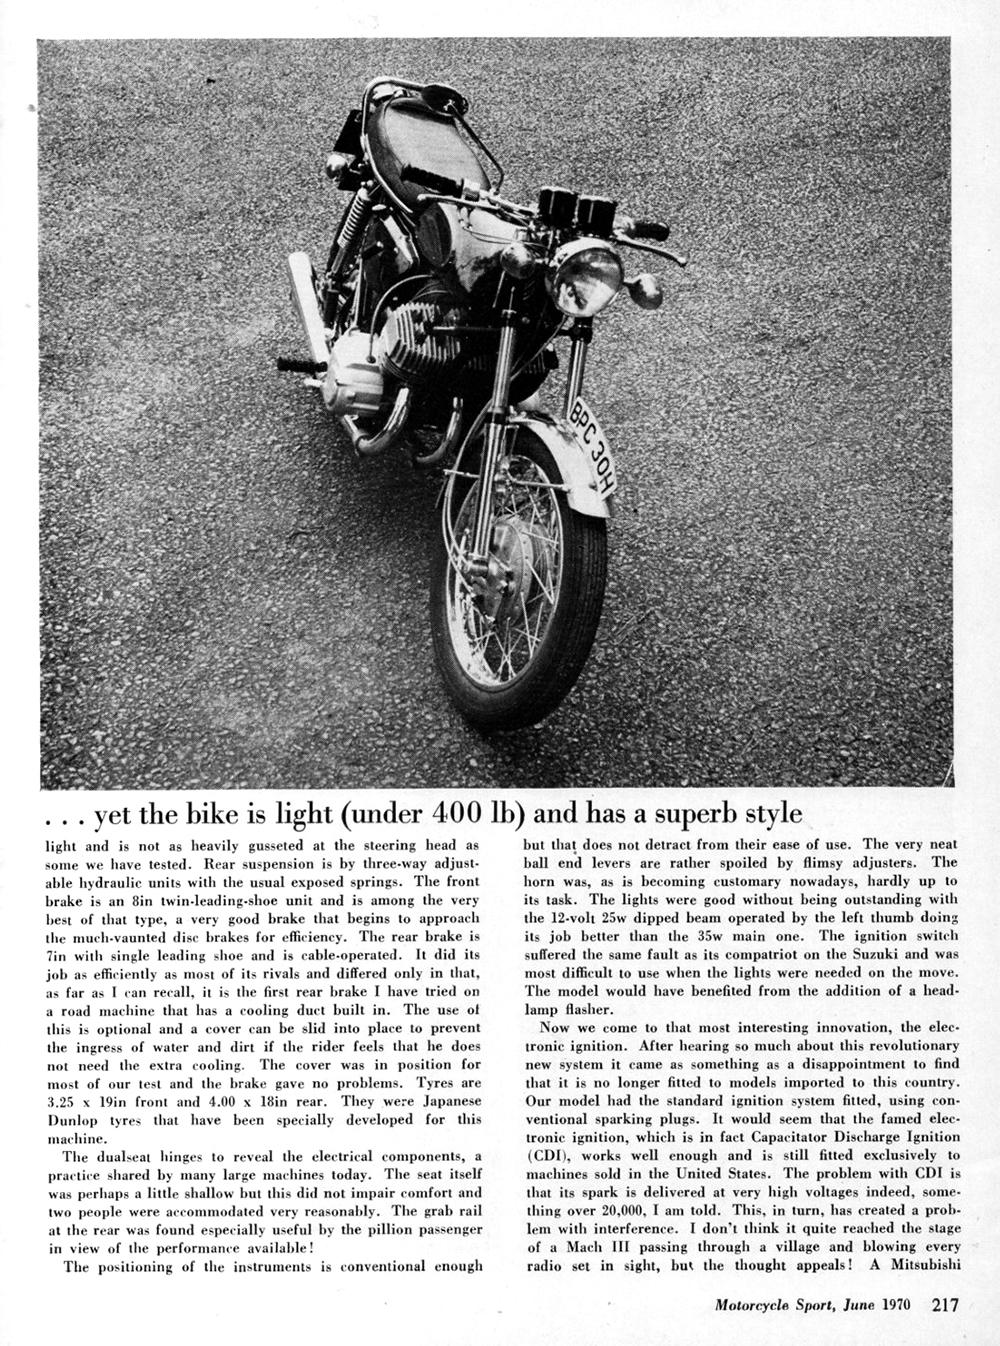 1970 Kawasaki 500 Mach 3 road test 4.jpg